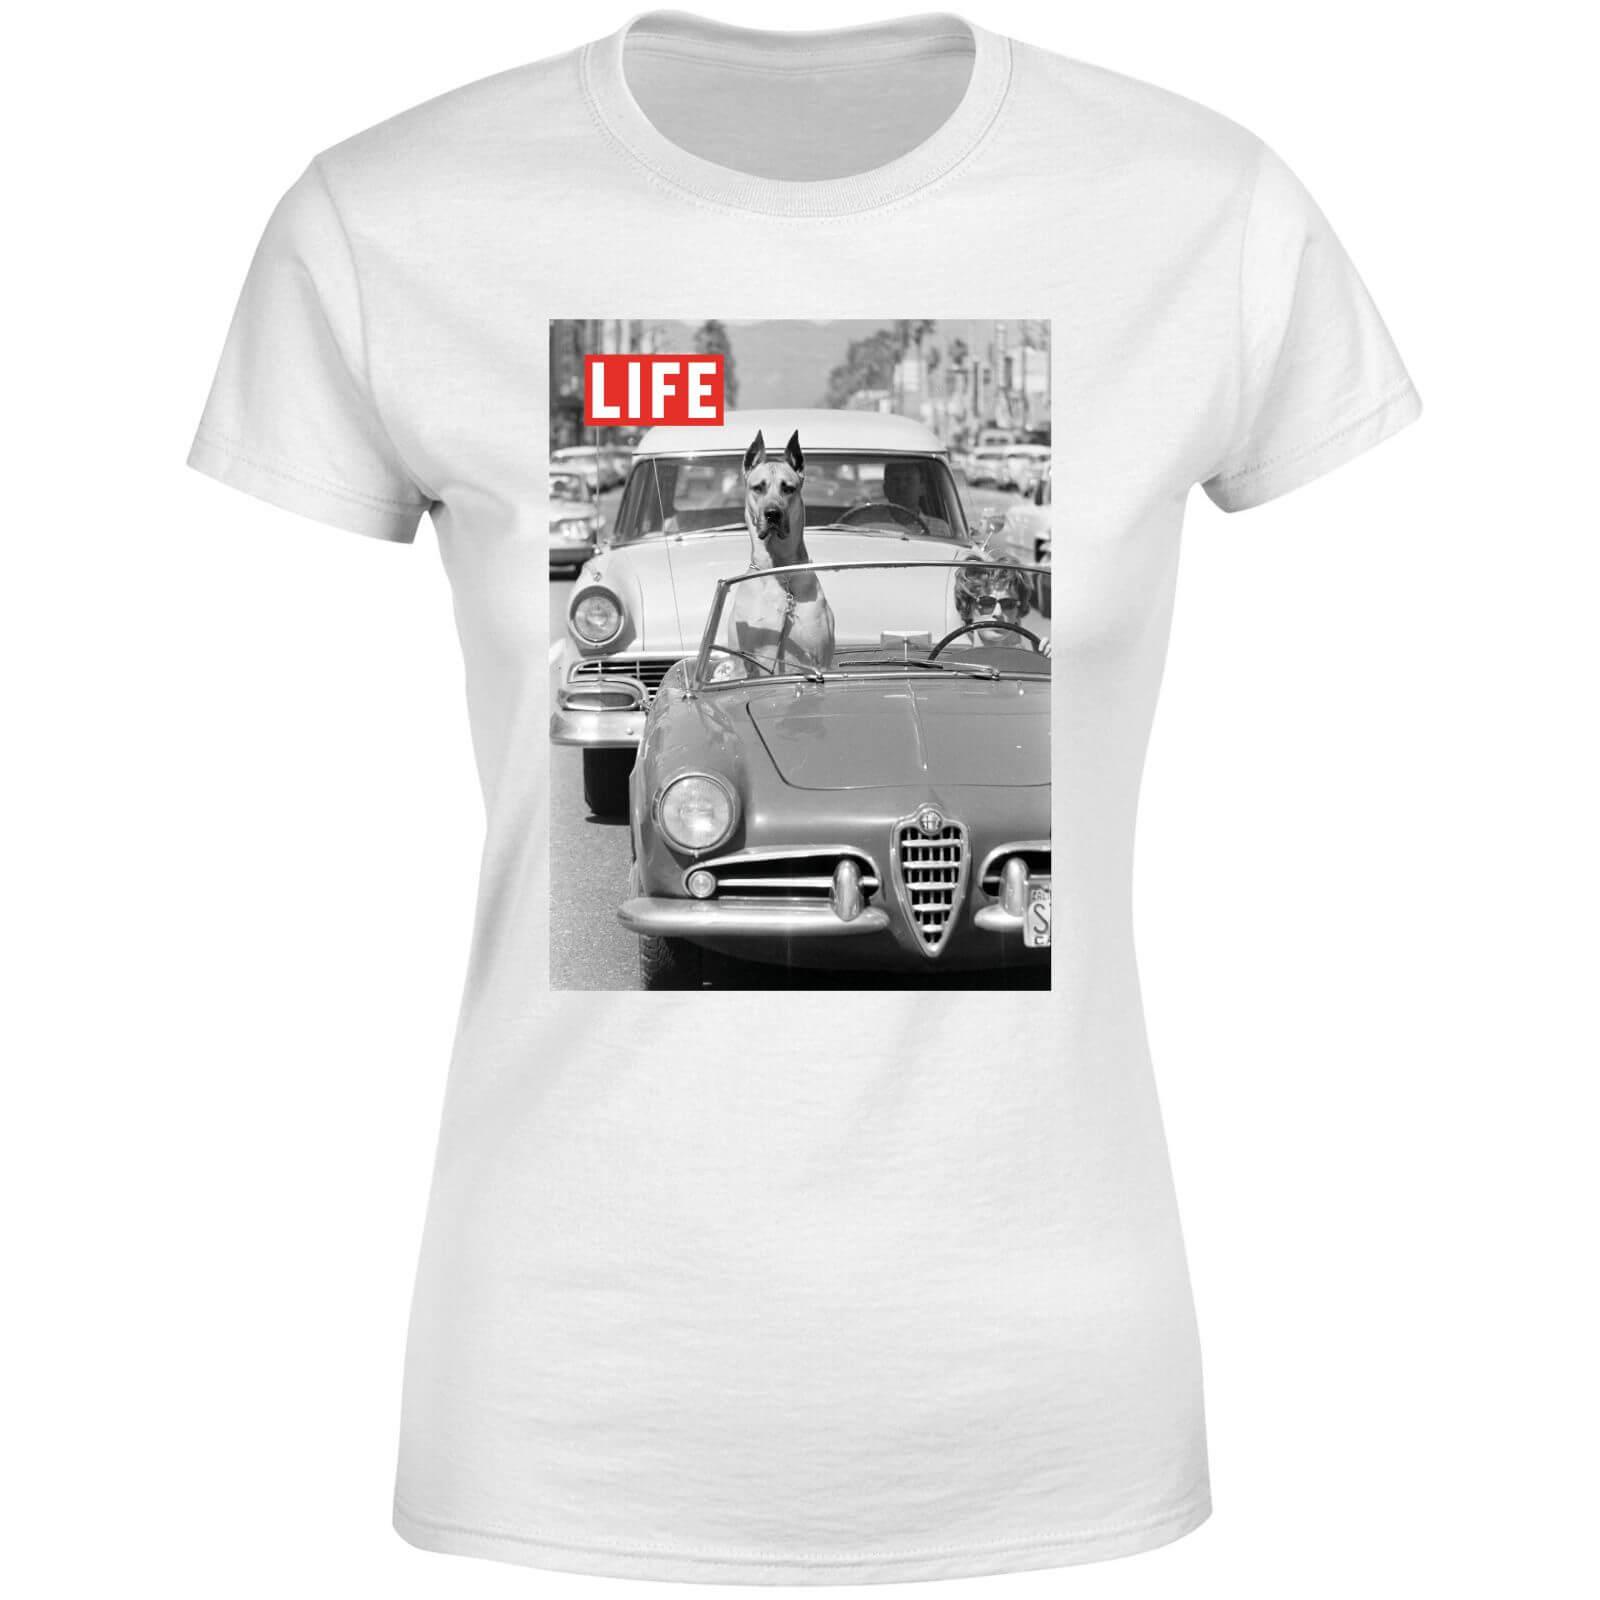 LIFE Magazine Dog In A Car Women's T-Shirt - White - S - White-female